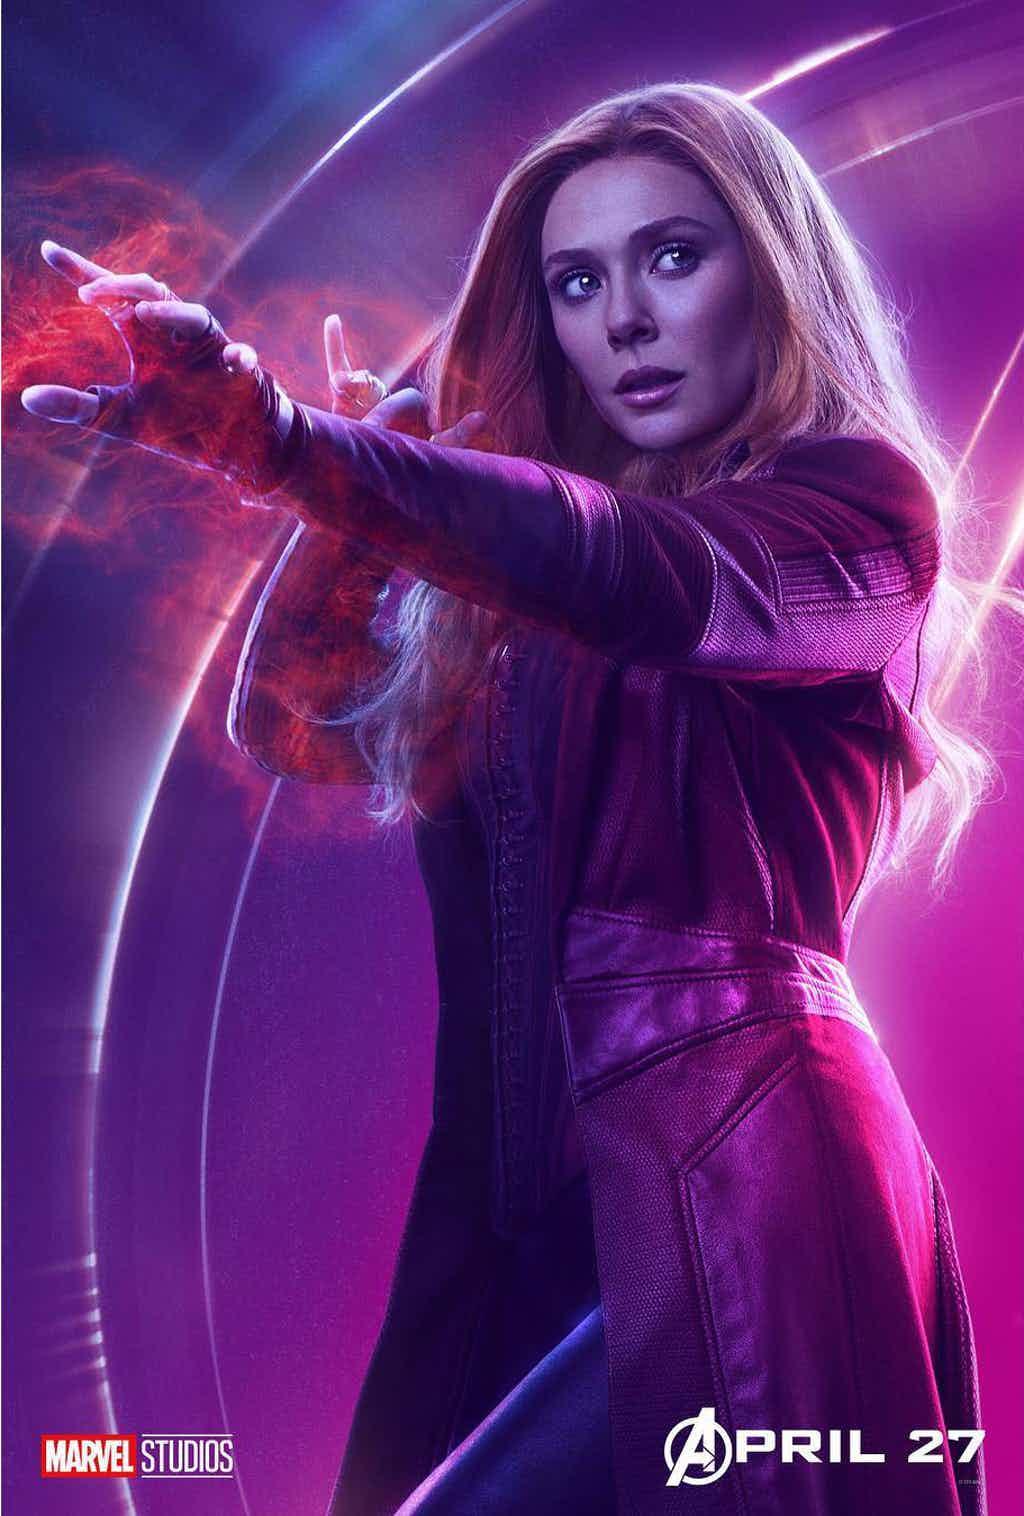 szmk_marvel_infinity_war_vegtelen_haboru_bosszuallok_avengers_ironman_hulk_thor_captainamaerica_guardians_galaxy_14.jpg